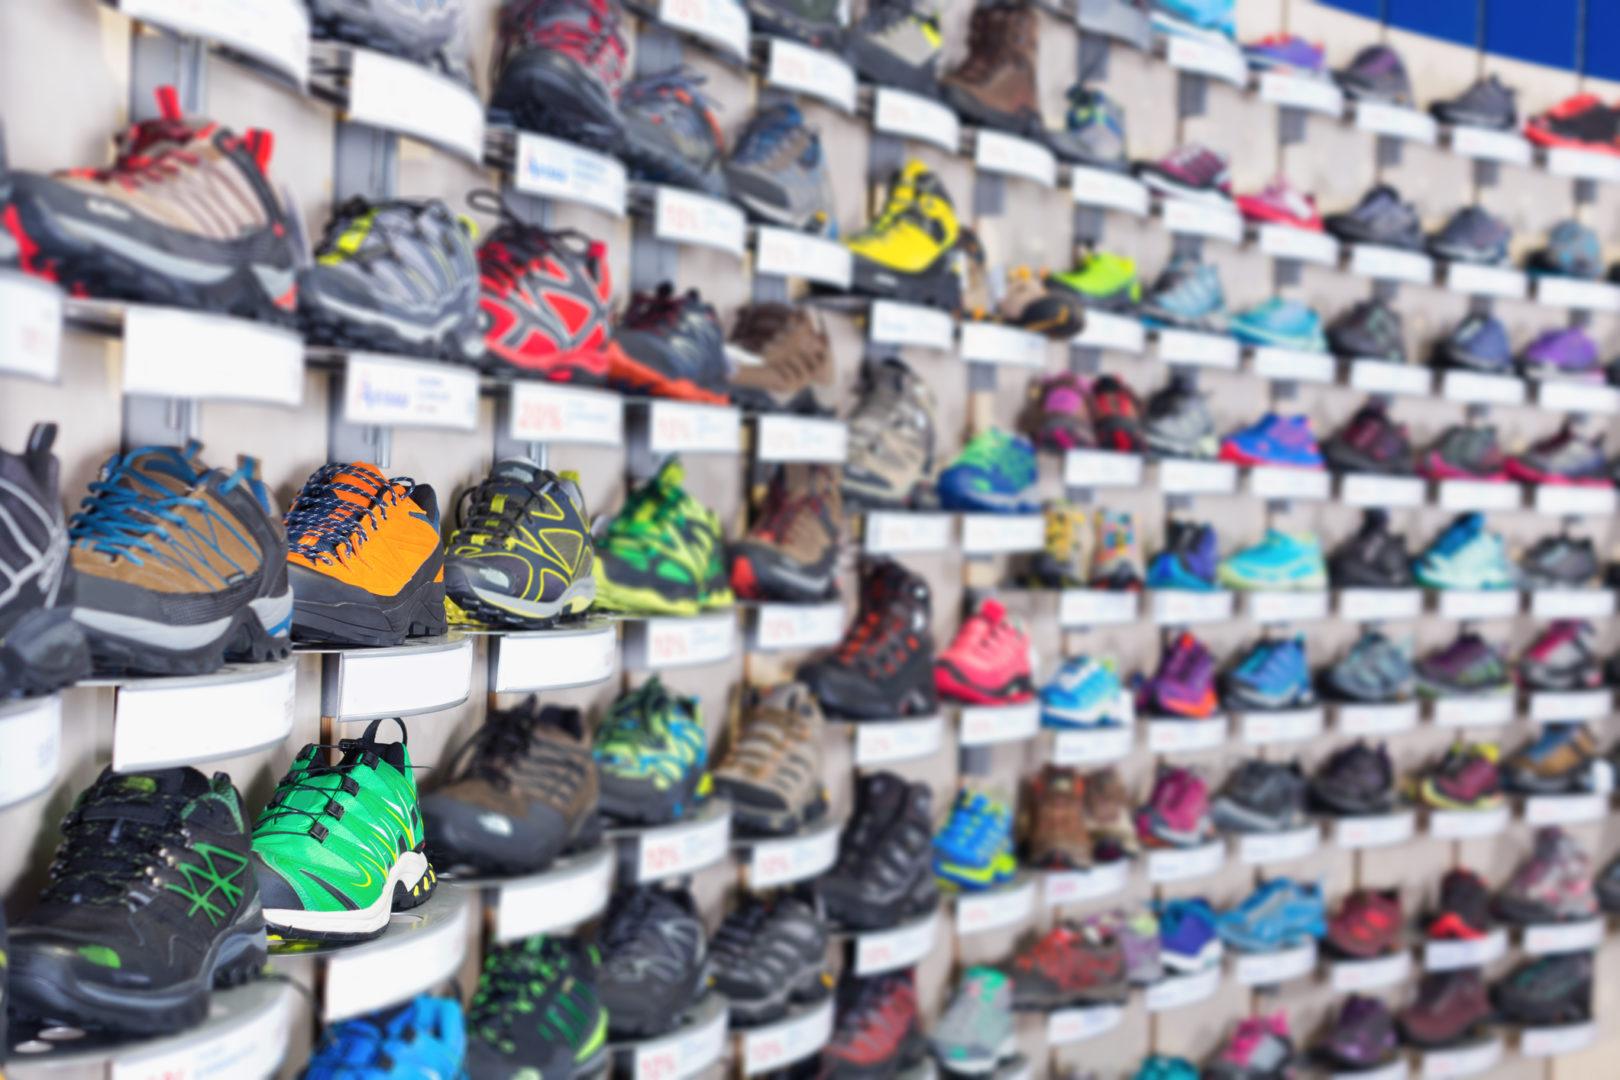 super popular 1738a 25510 Laufschuhe kaufen: Tipps zu Socken, Sprengung, Sohle ...